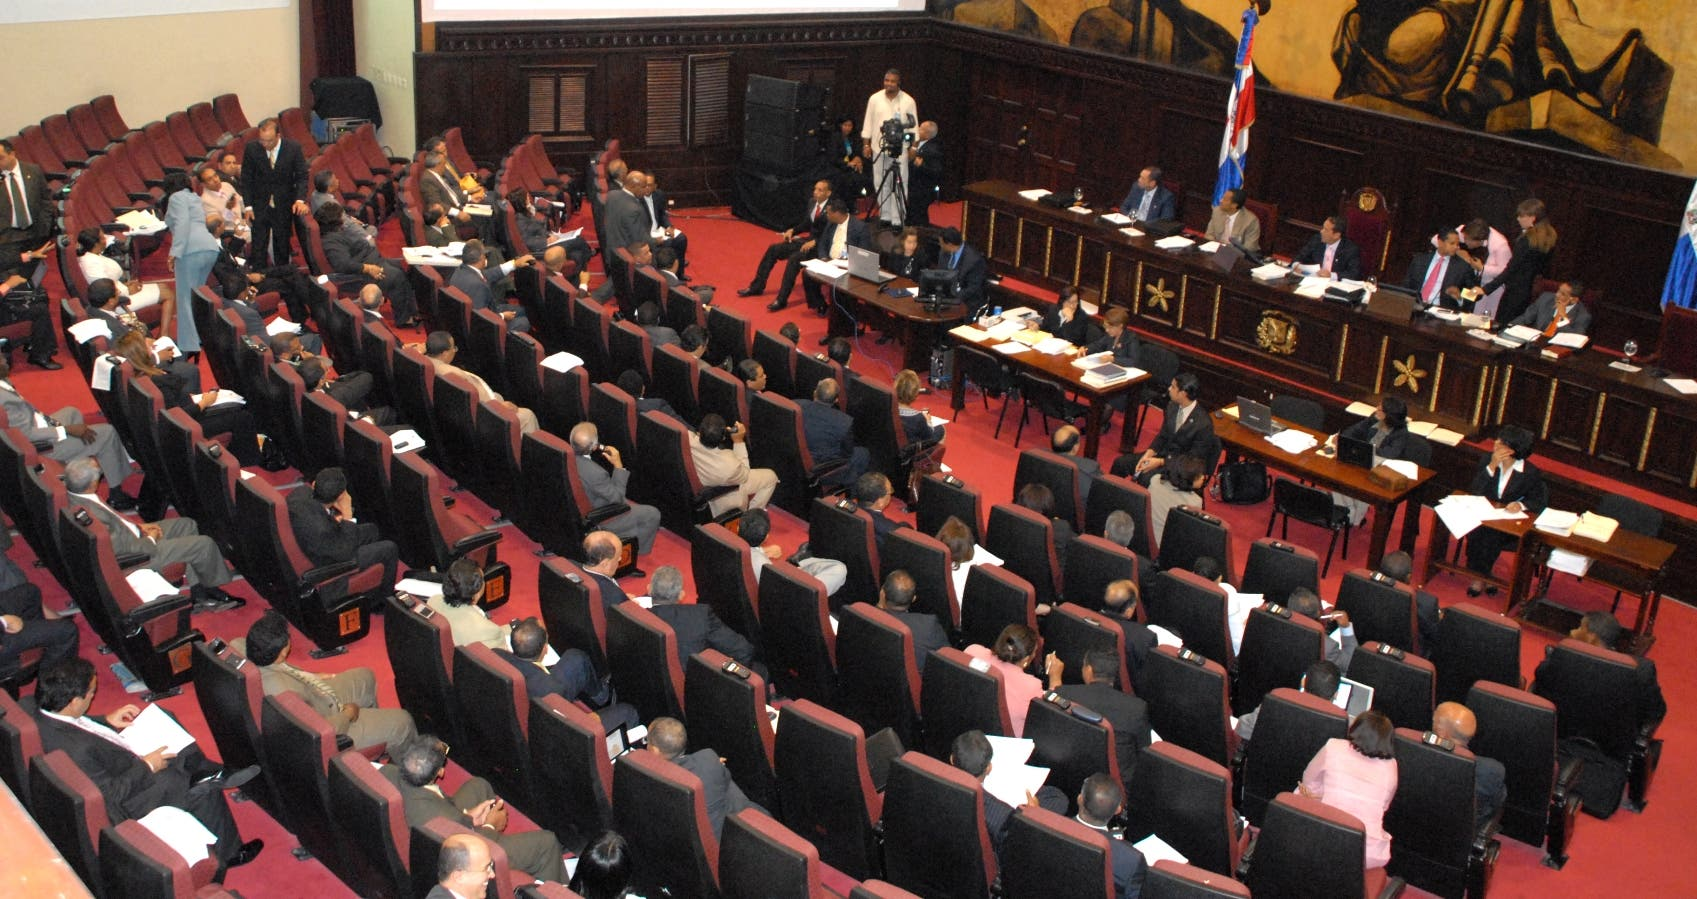 Congresistas del PLD asistirán a juramentación de Luis Abinader en Asamblea Nacional